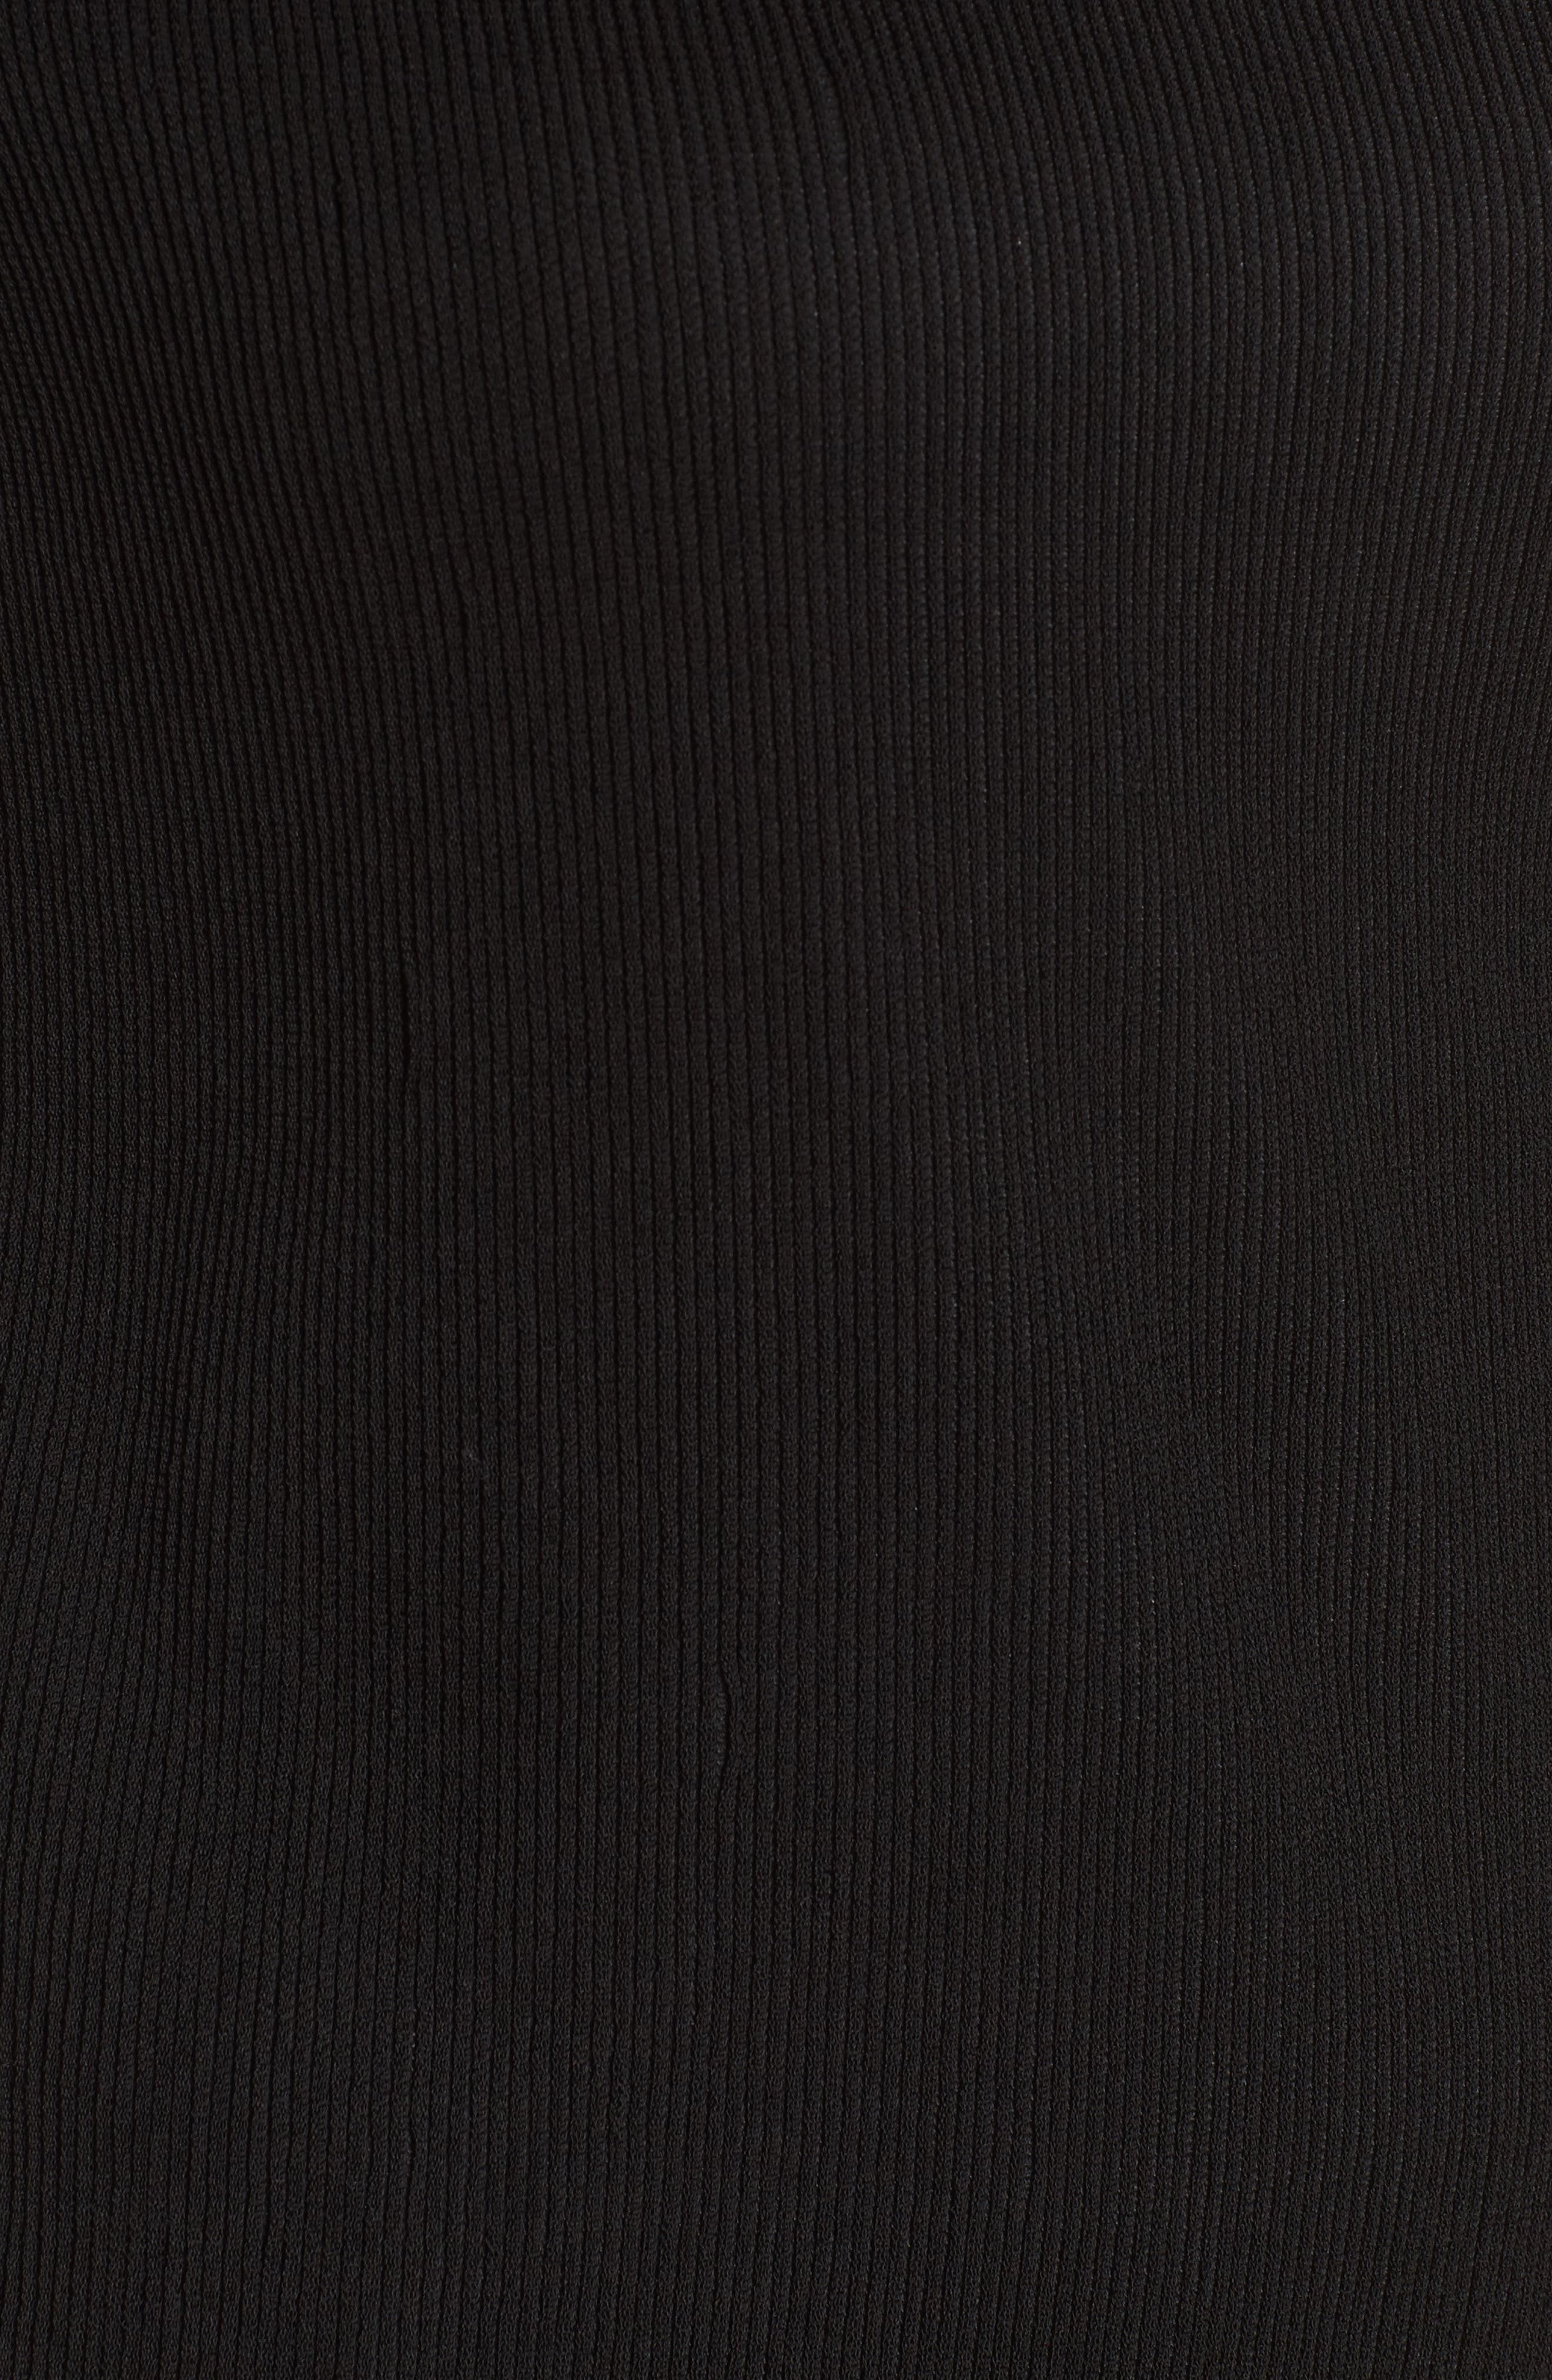 Etelina Sweater,                             Alternate thumbnail 5, color,                             Black